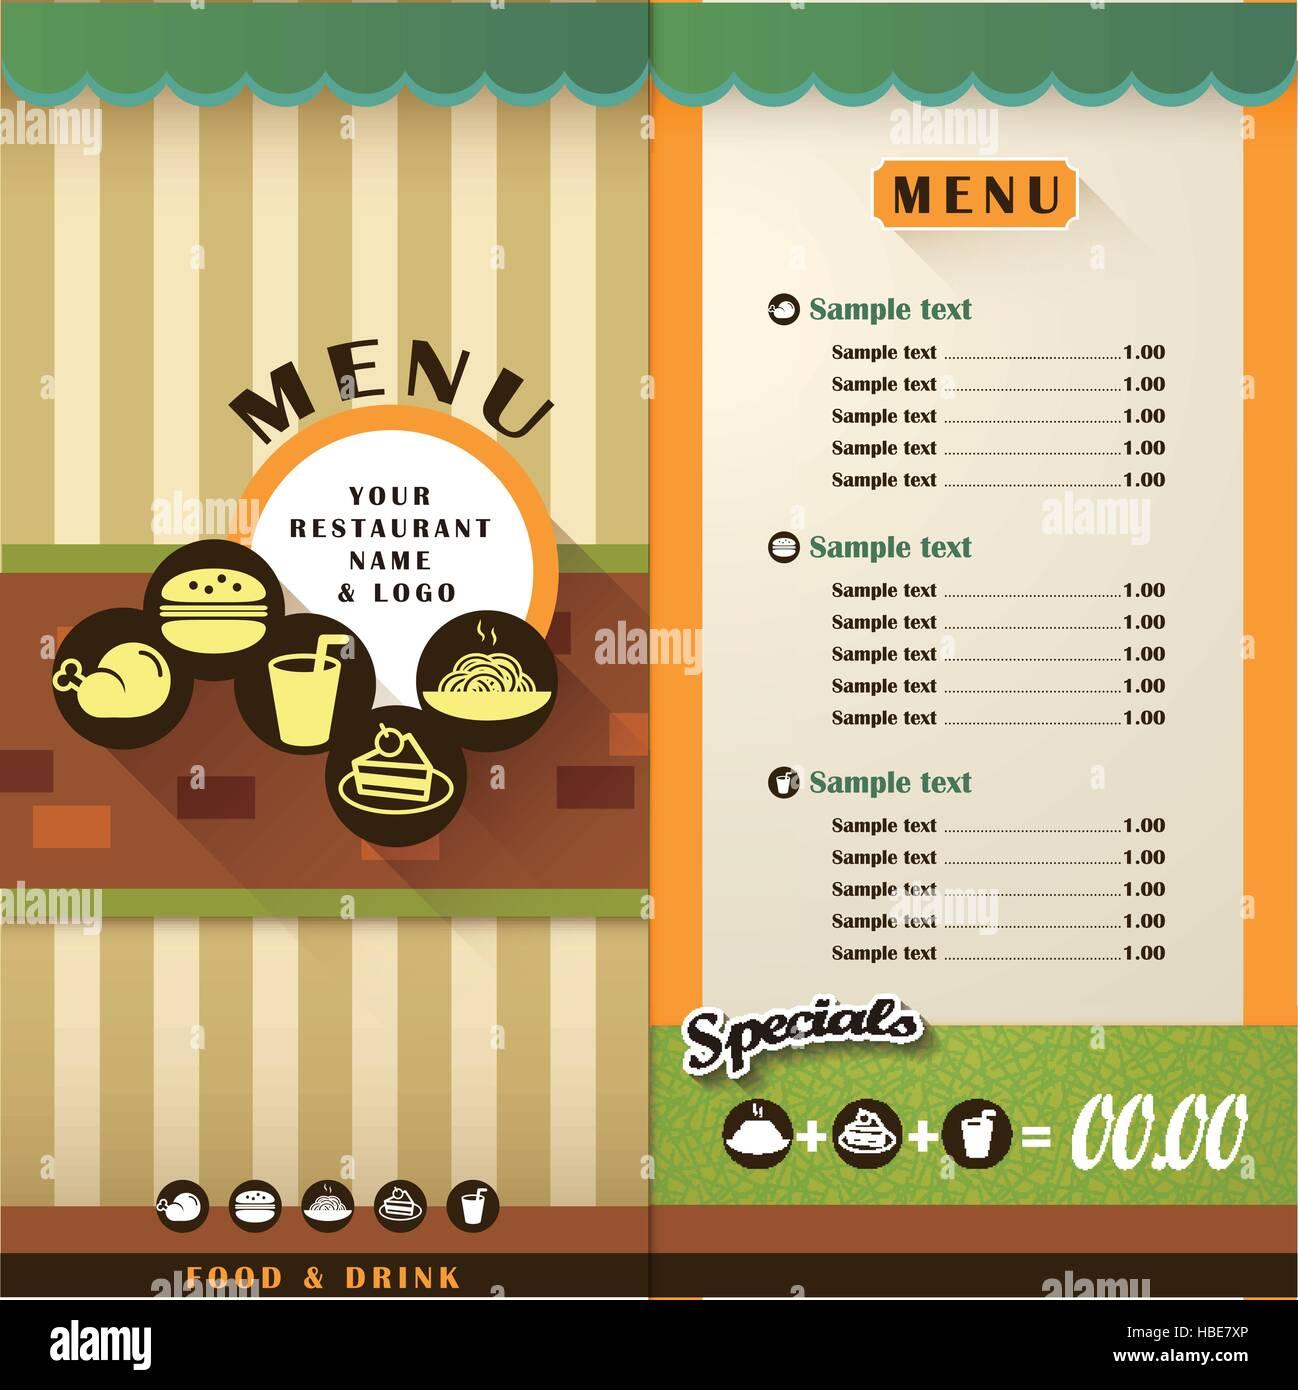 Vector Restaurant Menu Brochure And Cover Design Template Stock Vector Image Art Alamy